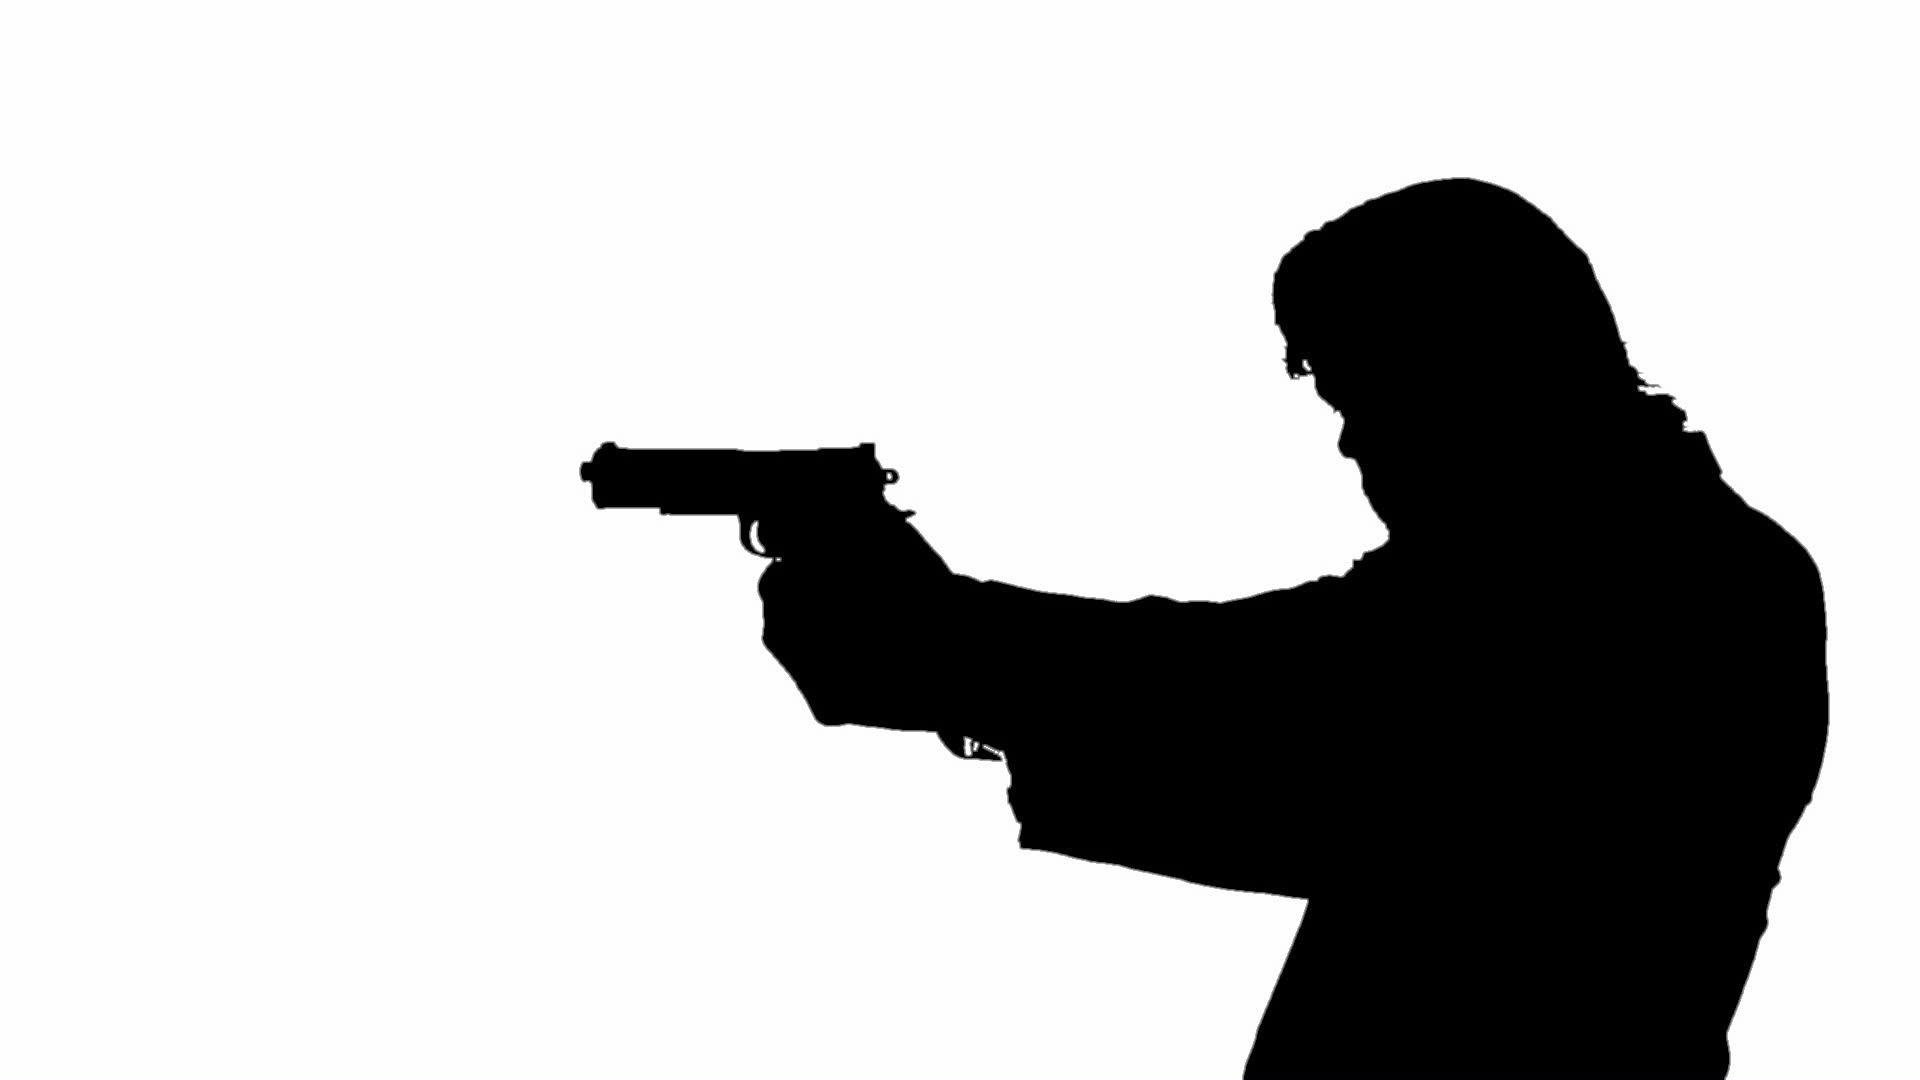 Kuwaiti national fatally shoots cousin, inquiry underway